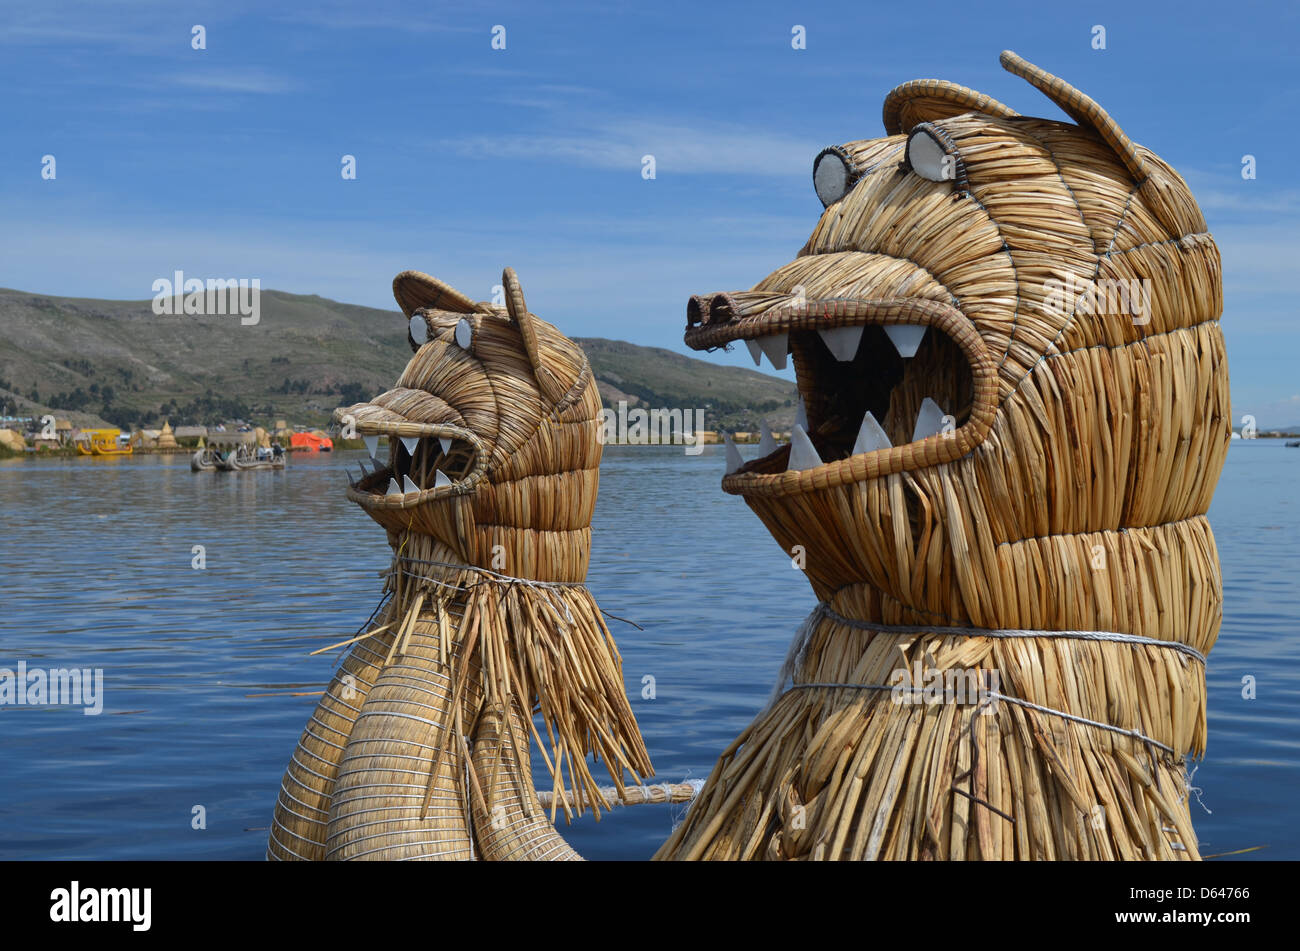 Totora reed boat, Lake Titicaca, Peru. - Stock Image